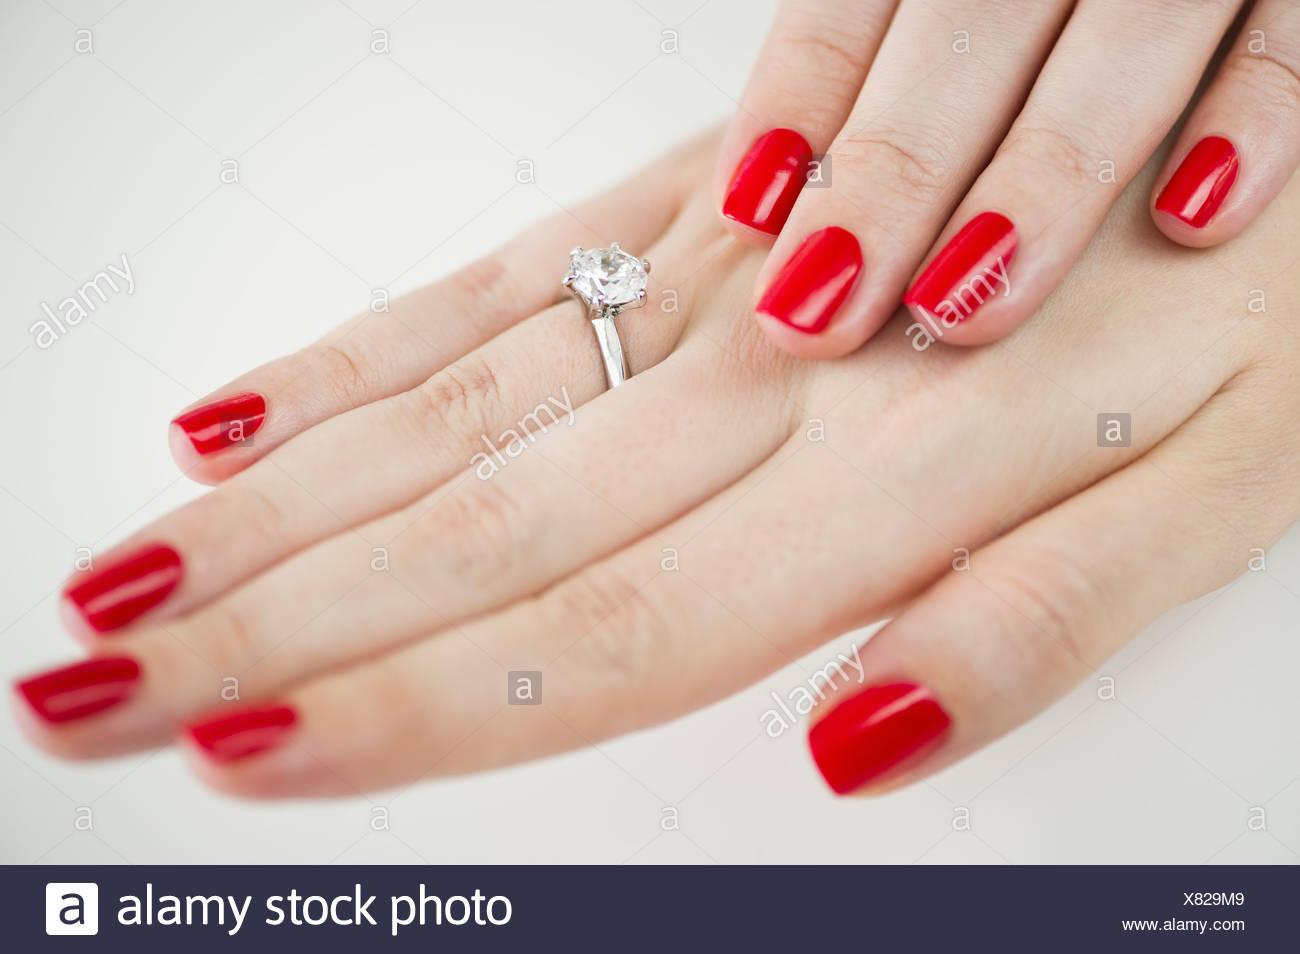 Wedding Band Hand Fingers Stockfotos & Wedding Band Hand Fingers ...